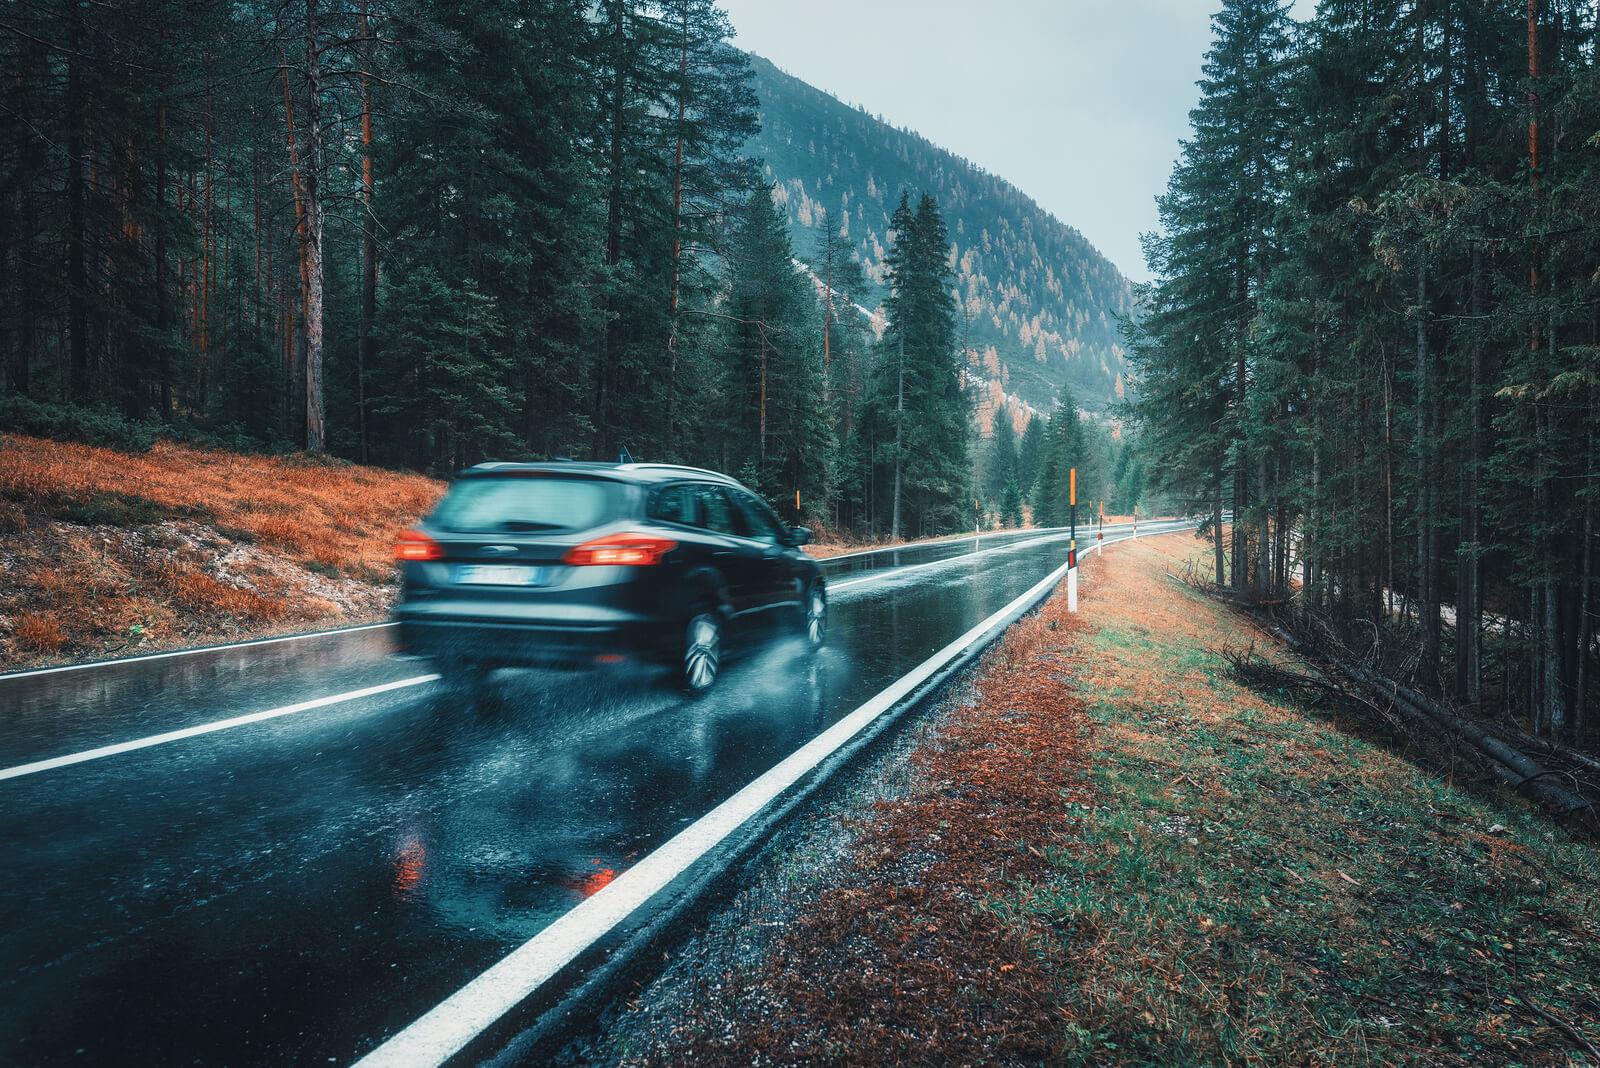 Angel's Transmission & Auto Repair Blog - Orange County - Holiday Road Trip